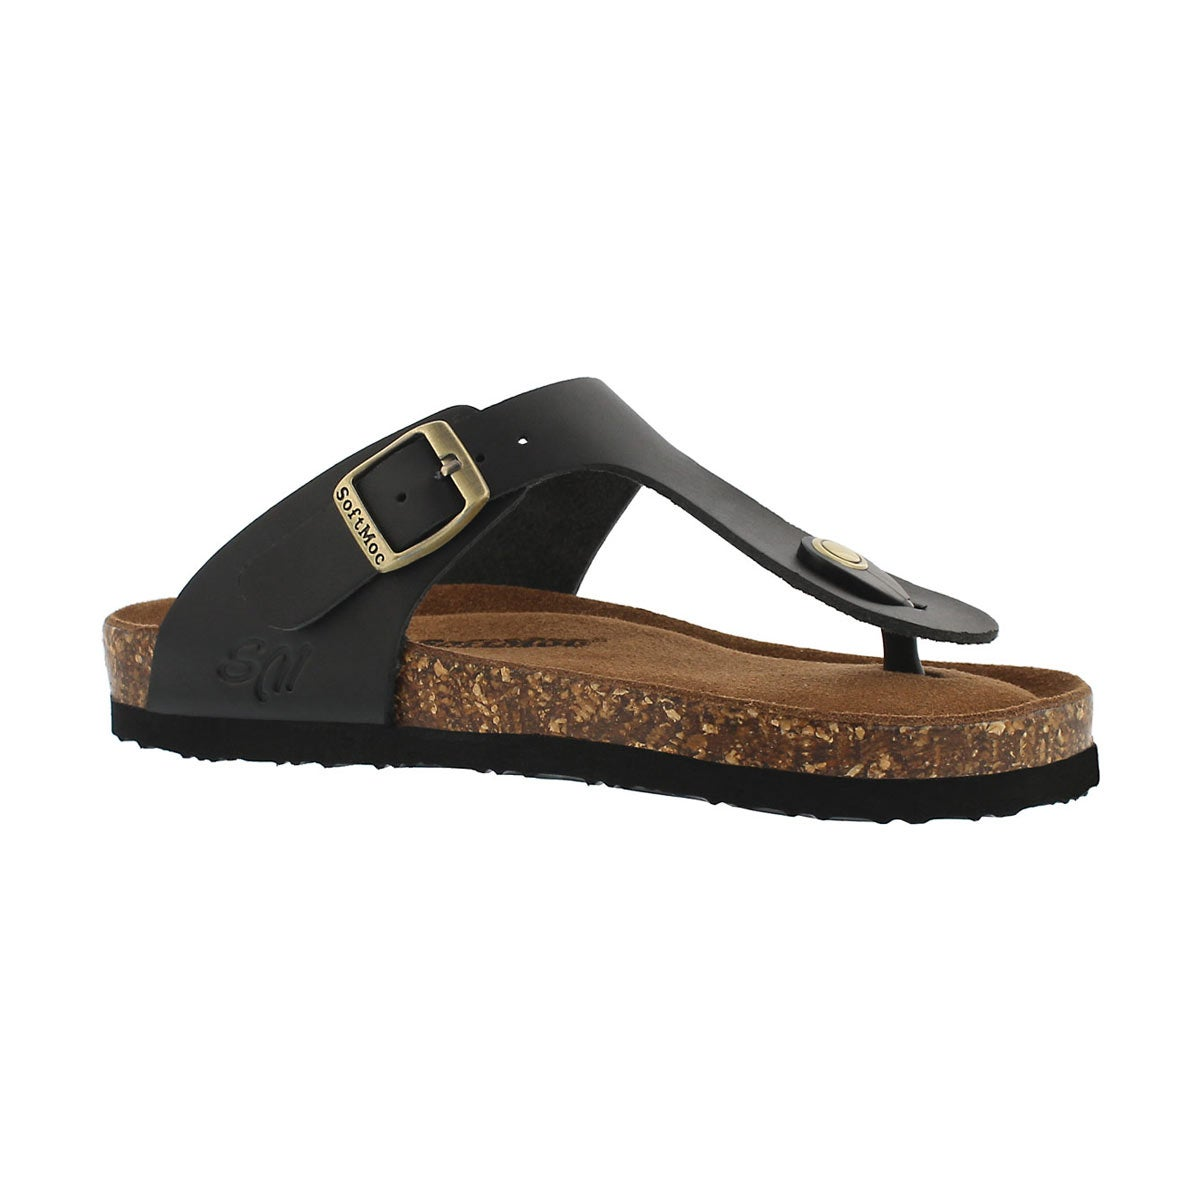 Grls Angy 5 blk memory foam thng sandal